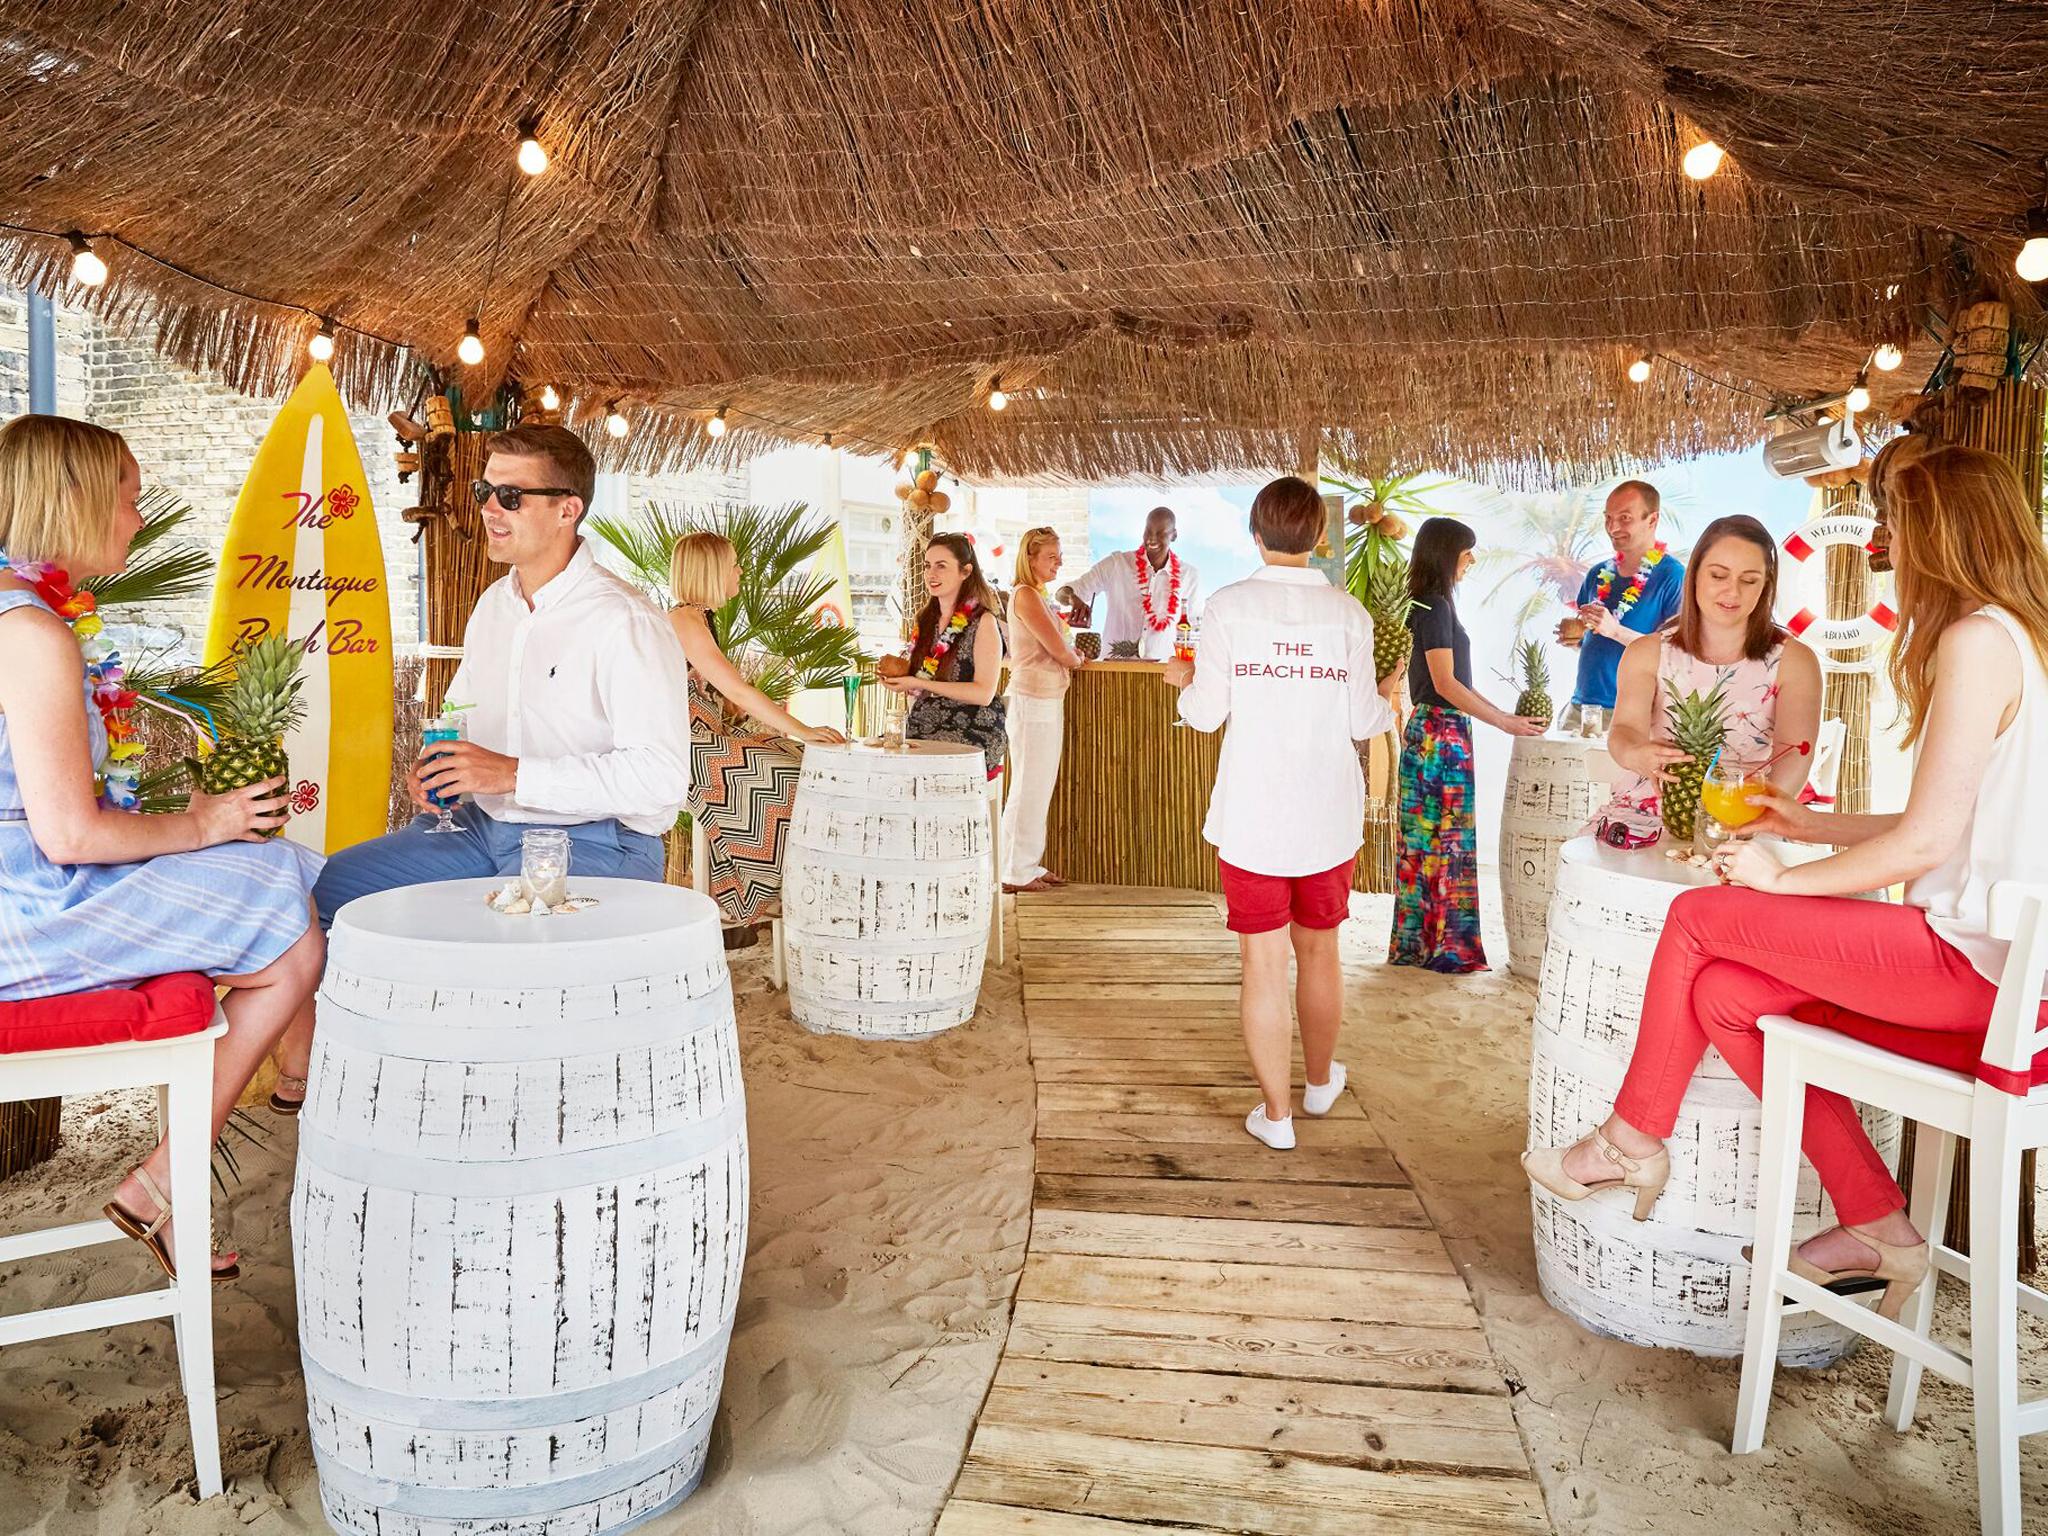 best beach bars in London, montague on the gardens beach bar